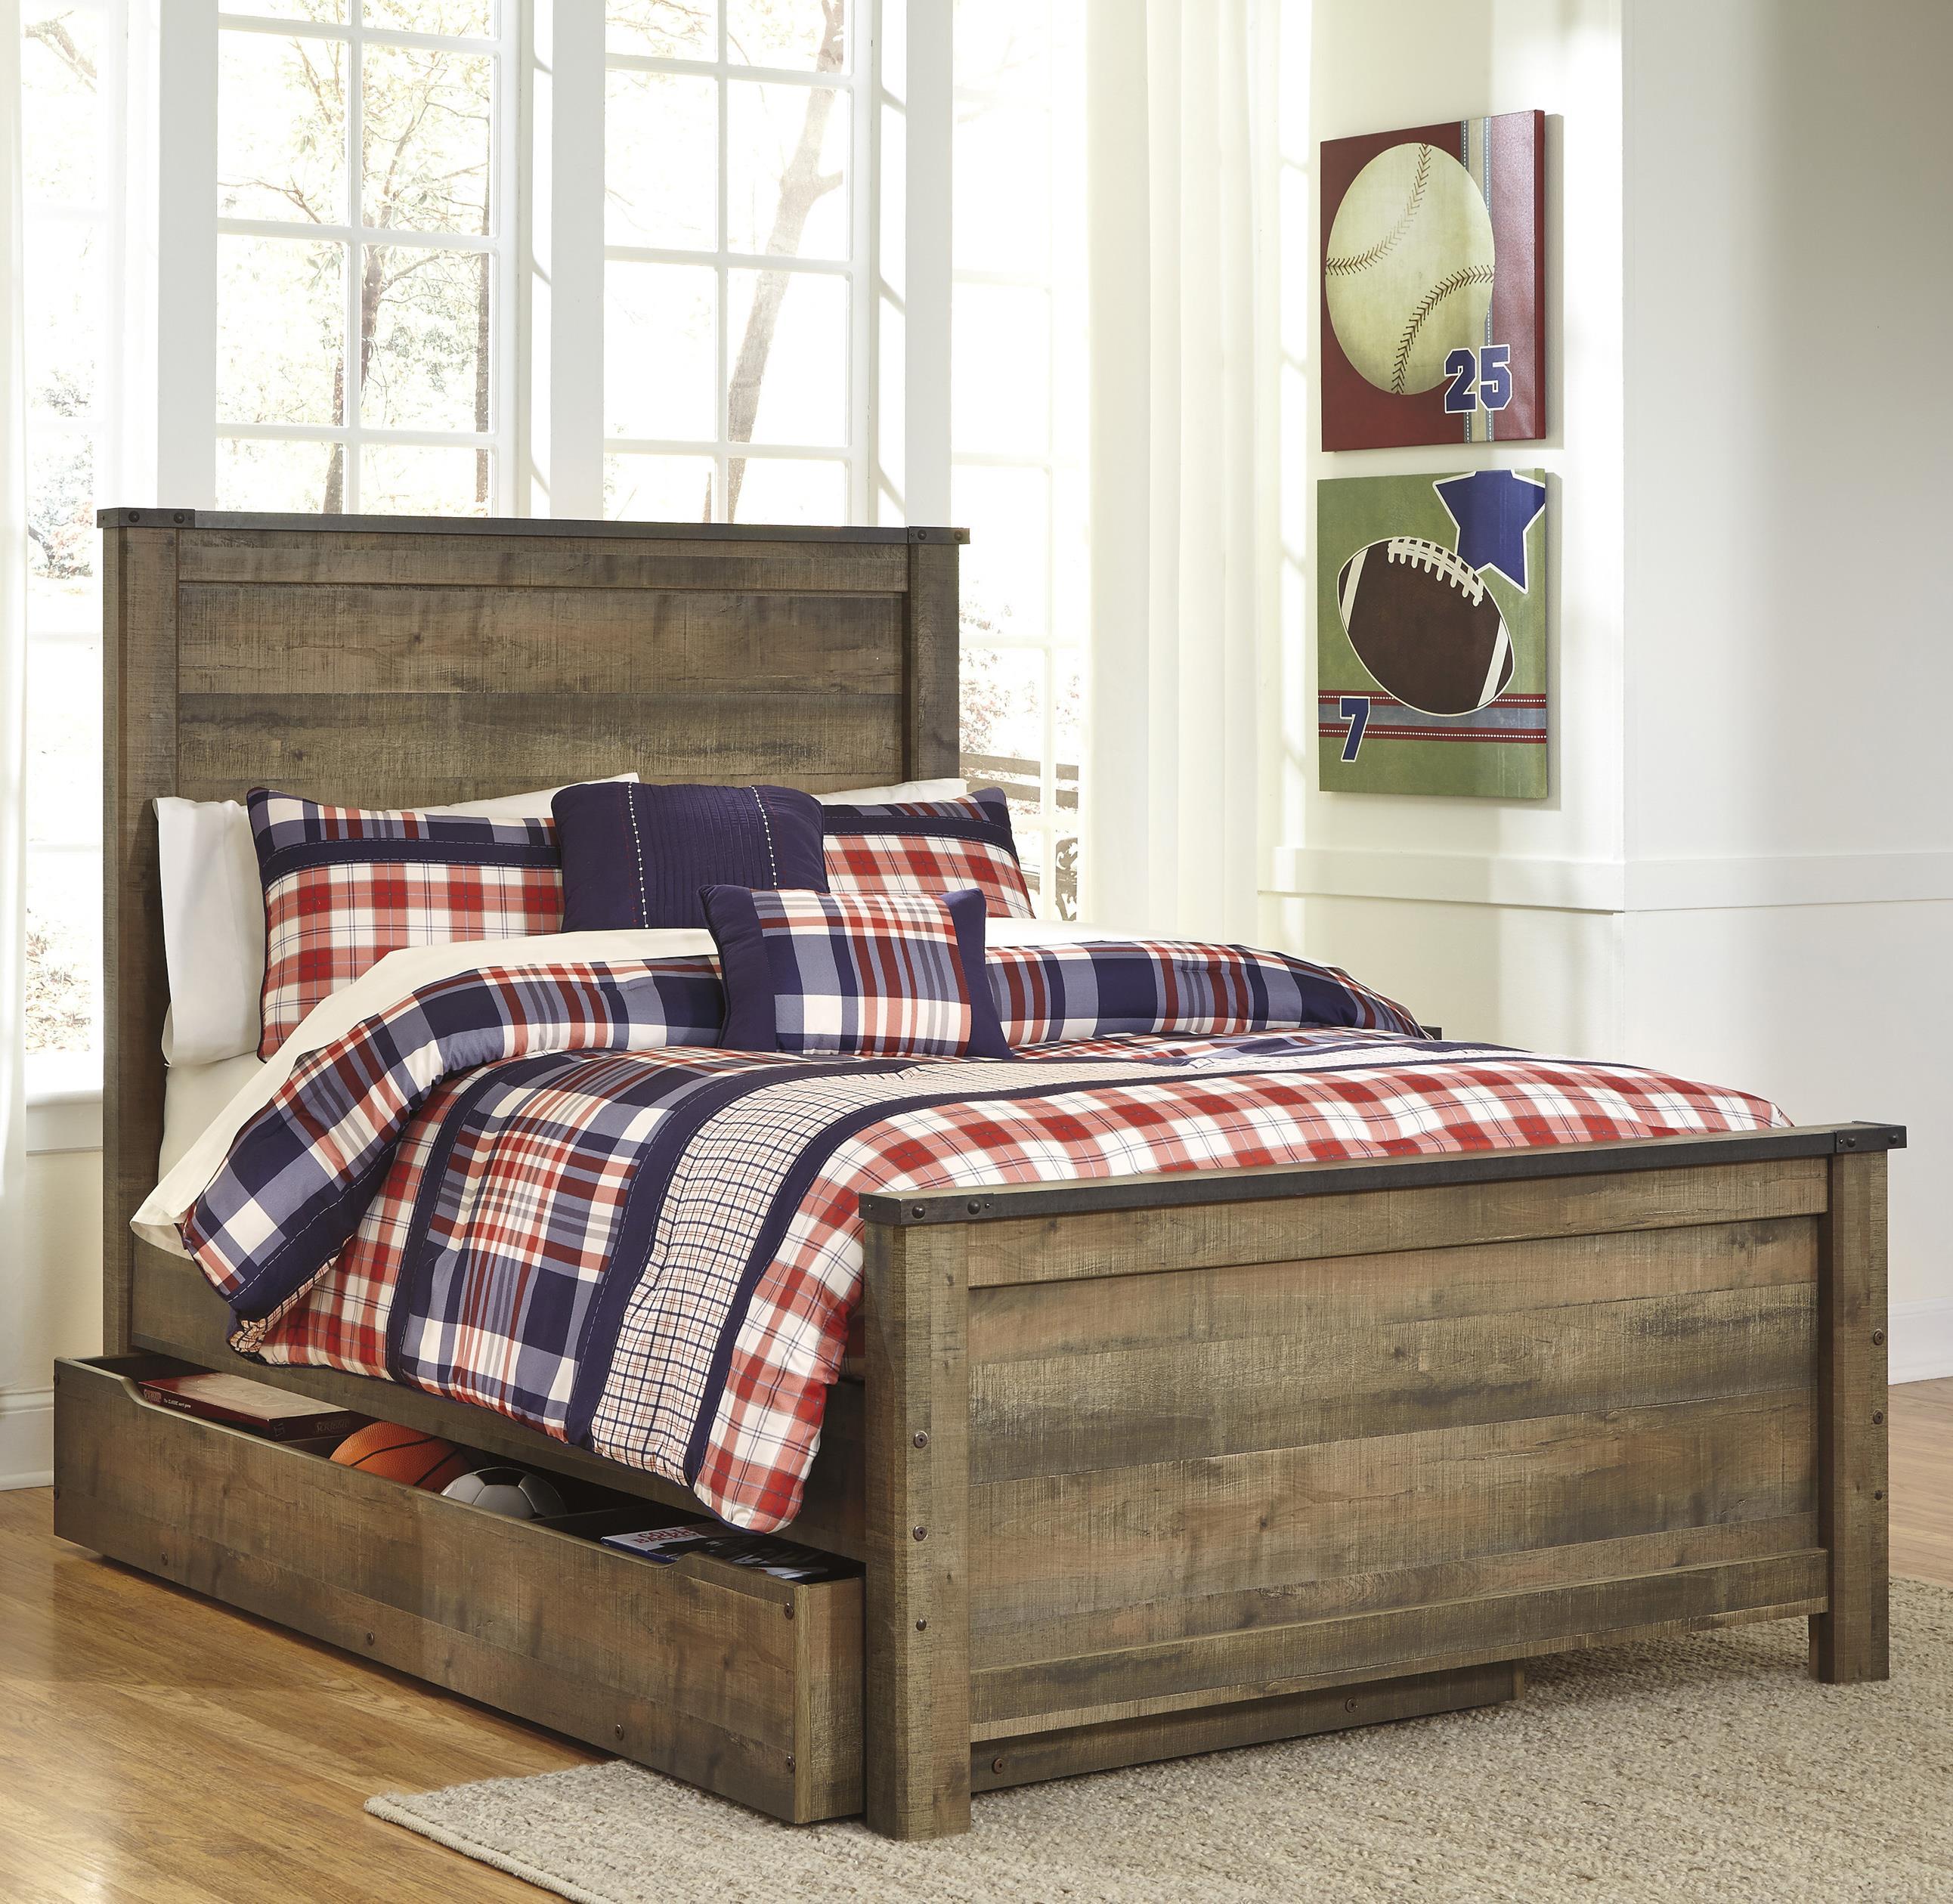 lauren ashley 60 zero wall sofa recliner l shaped set designs signature design by trinell rustic look full panel